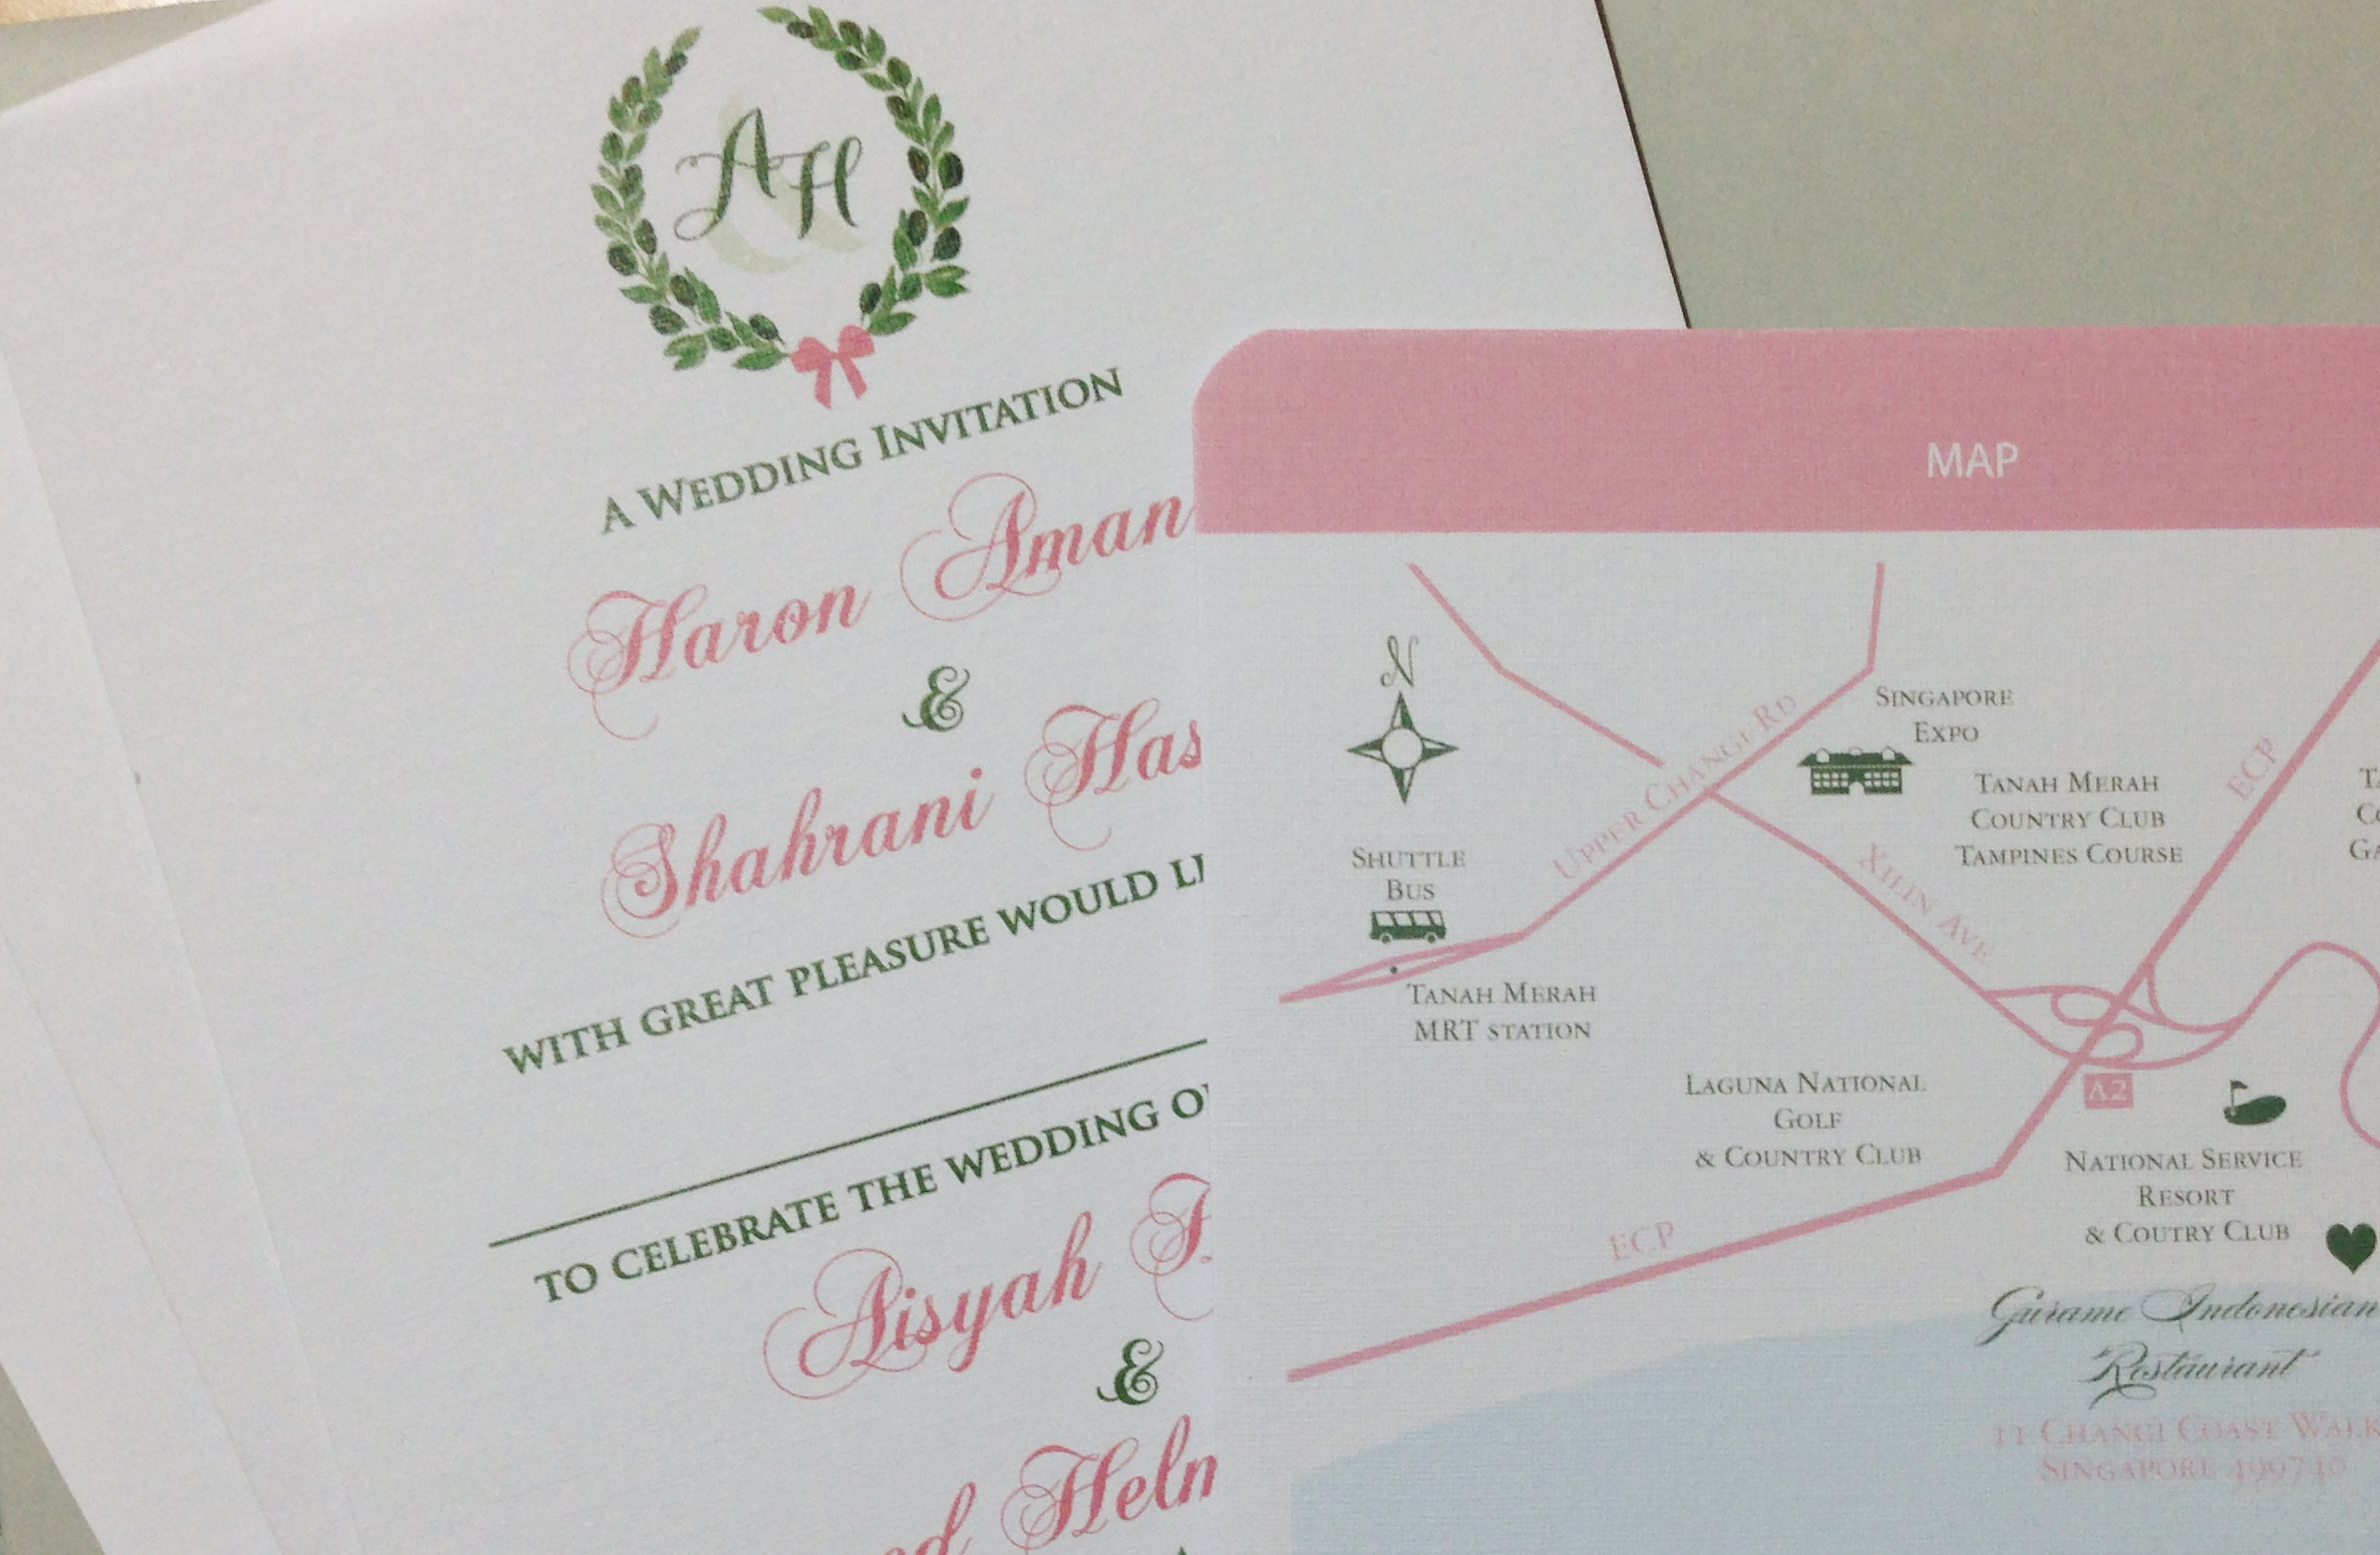 Aisyah Helmi Wedding Card